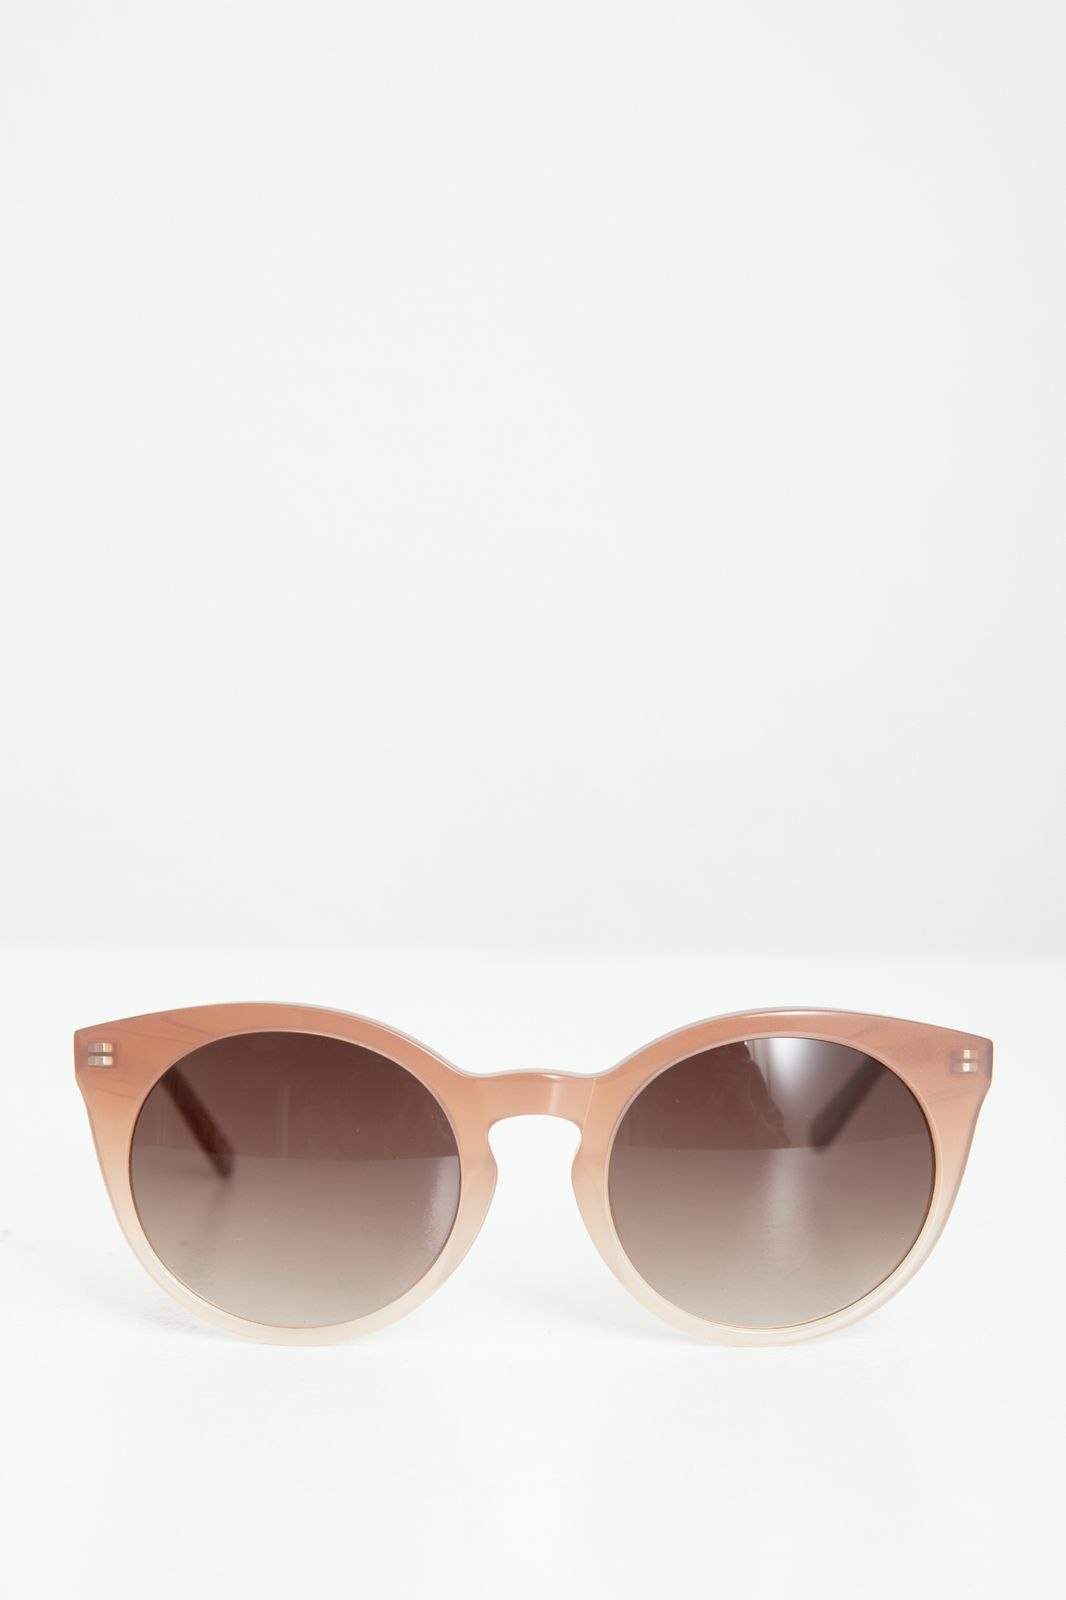 Roze zonnebril dames met metalen pootjes - Dames   Sissy-Boy